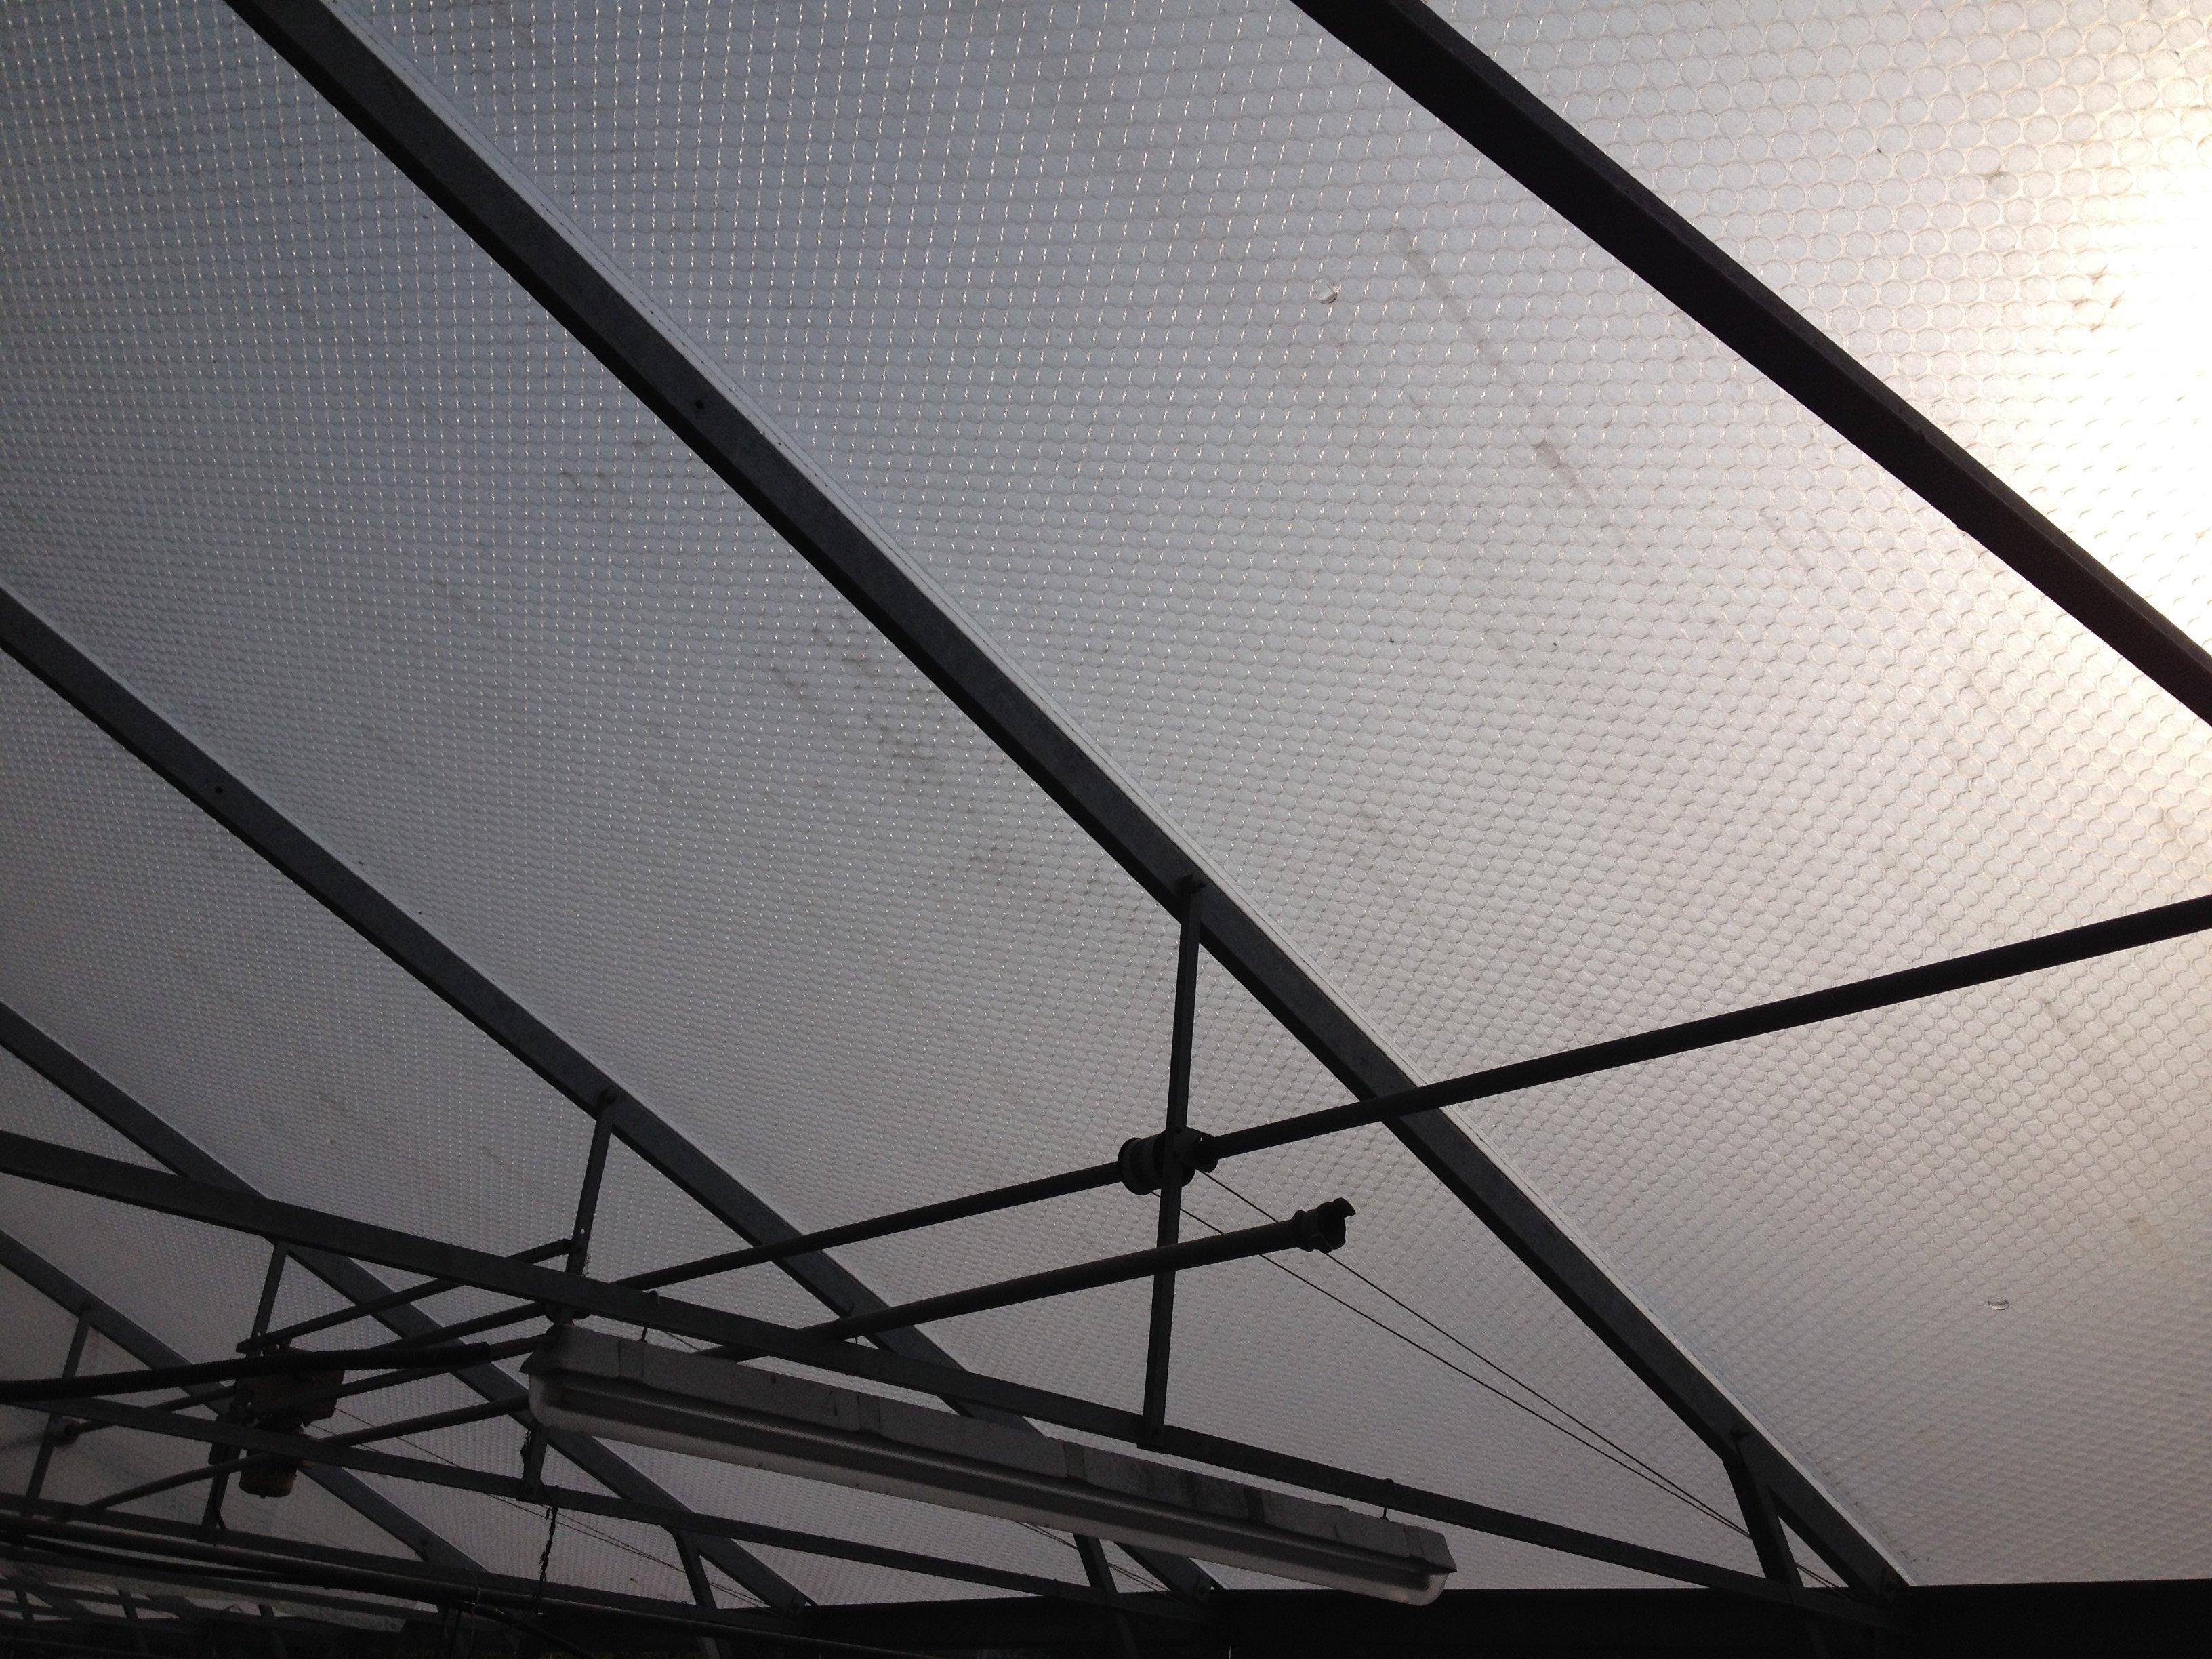 20 year old film on greenhouse.jpg